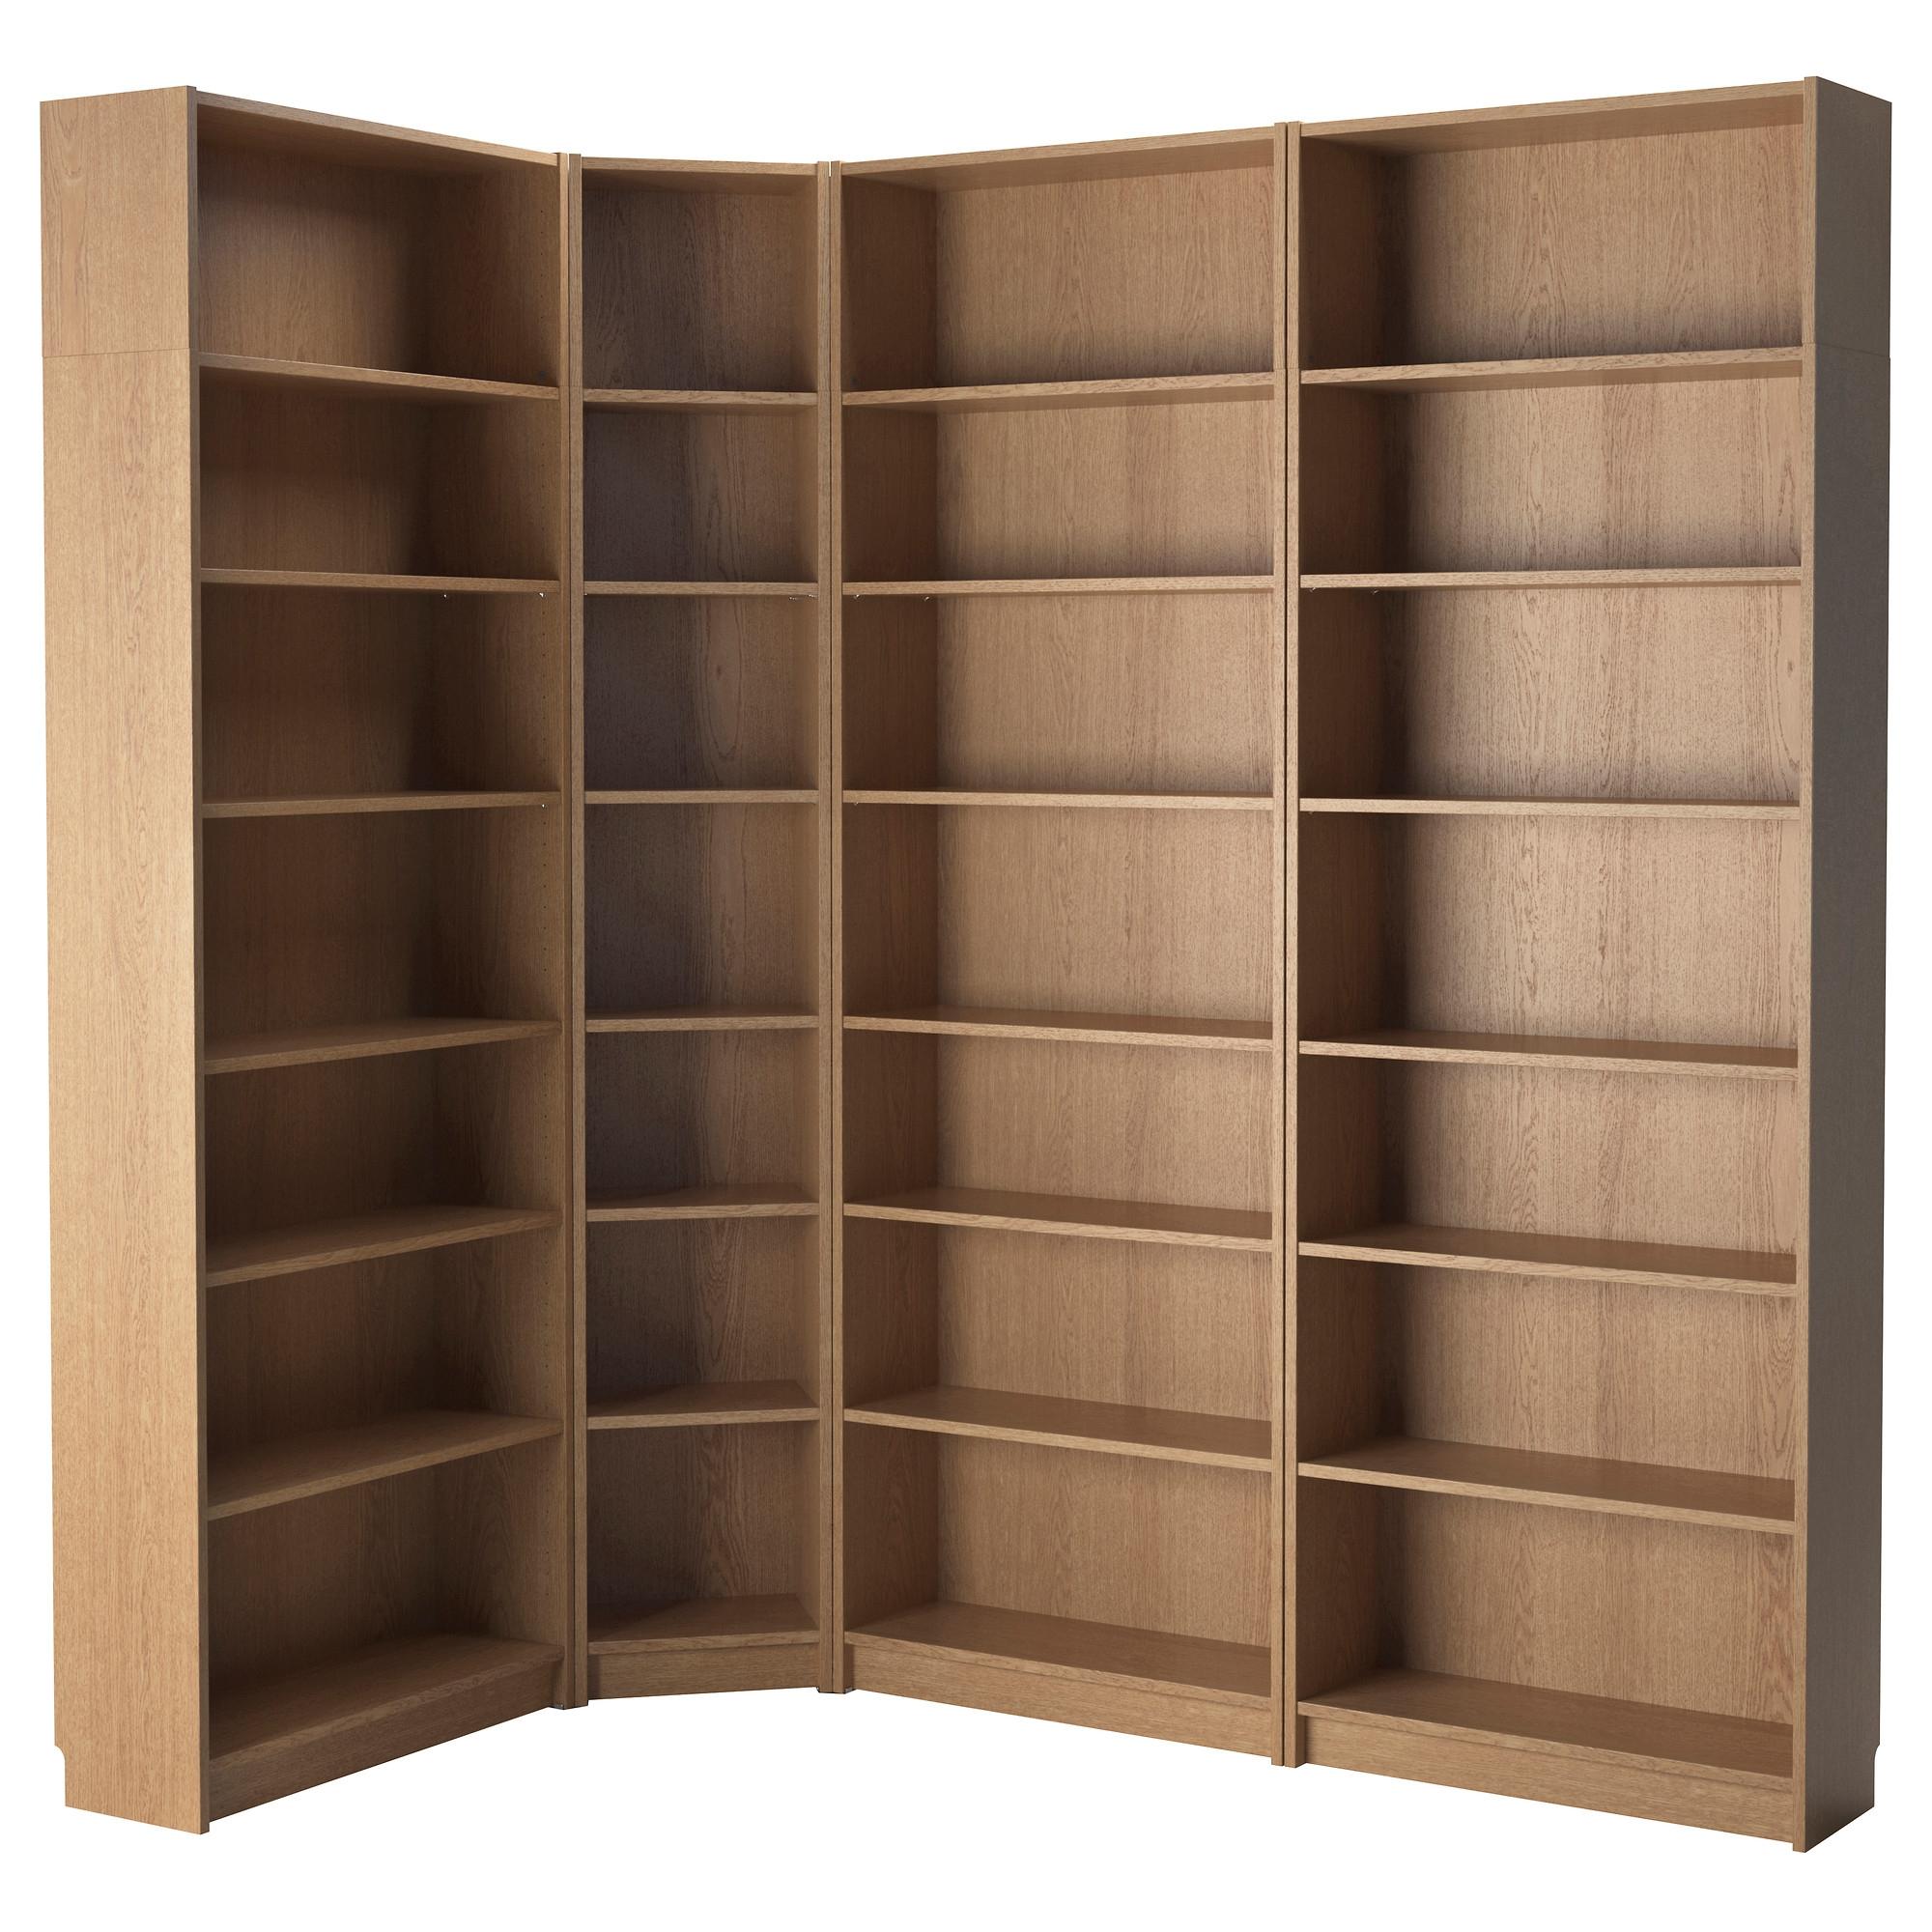 Furniture Interesting Corner Ikea Hemnes Bookcase With Oak Wood For Corner Oak Bookcase (View 6 of 15)